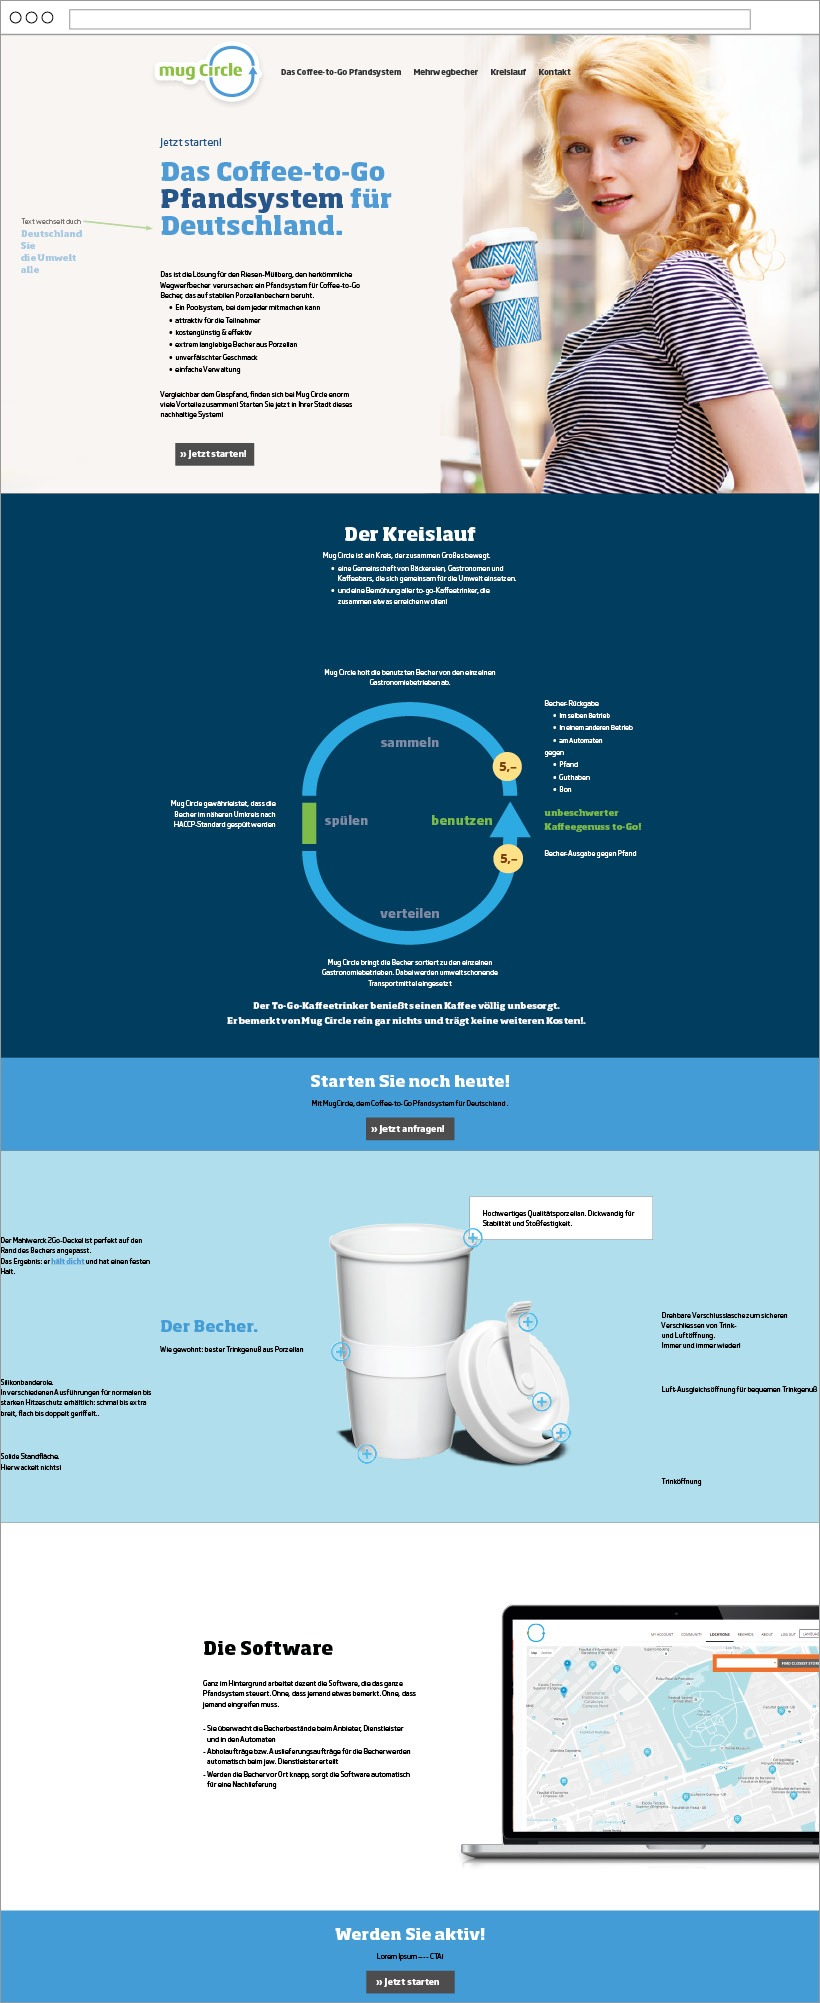 Mug Circle mehrweg website design von Ingo Moeller